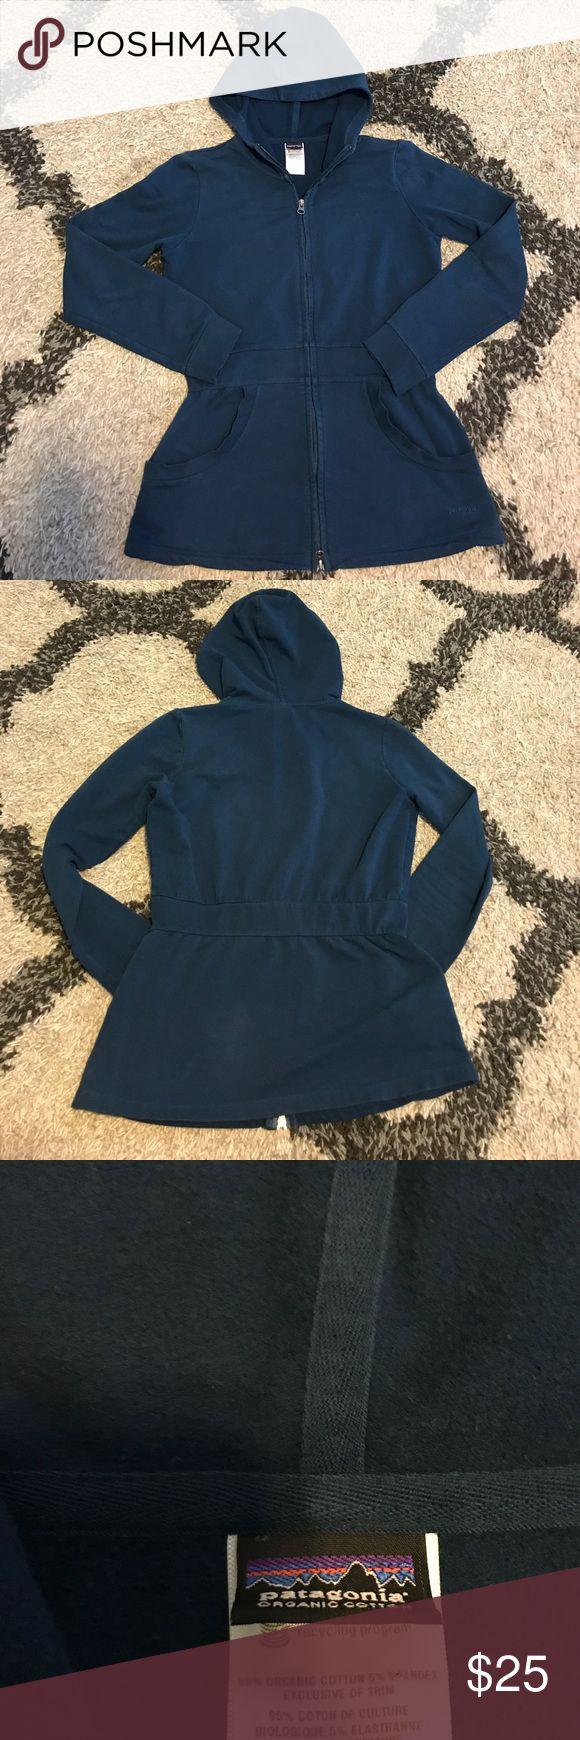 Women's Patagonia Full-Zip Jacket (S) Women's Patagonia Full-Zip Jacket (S) Good Condition Patagonia Jackets & Coats